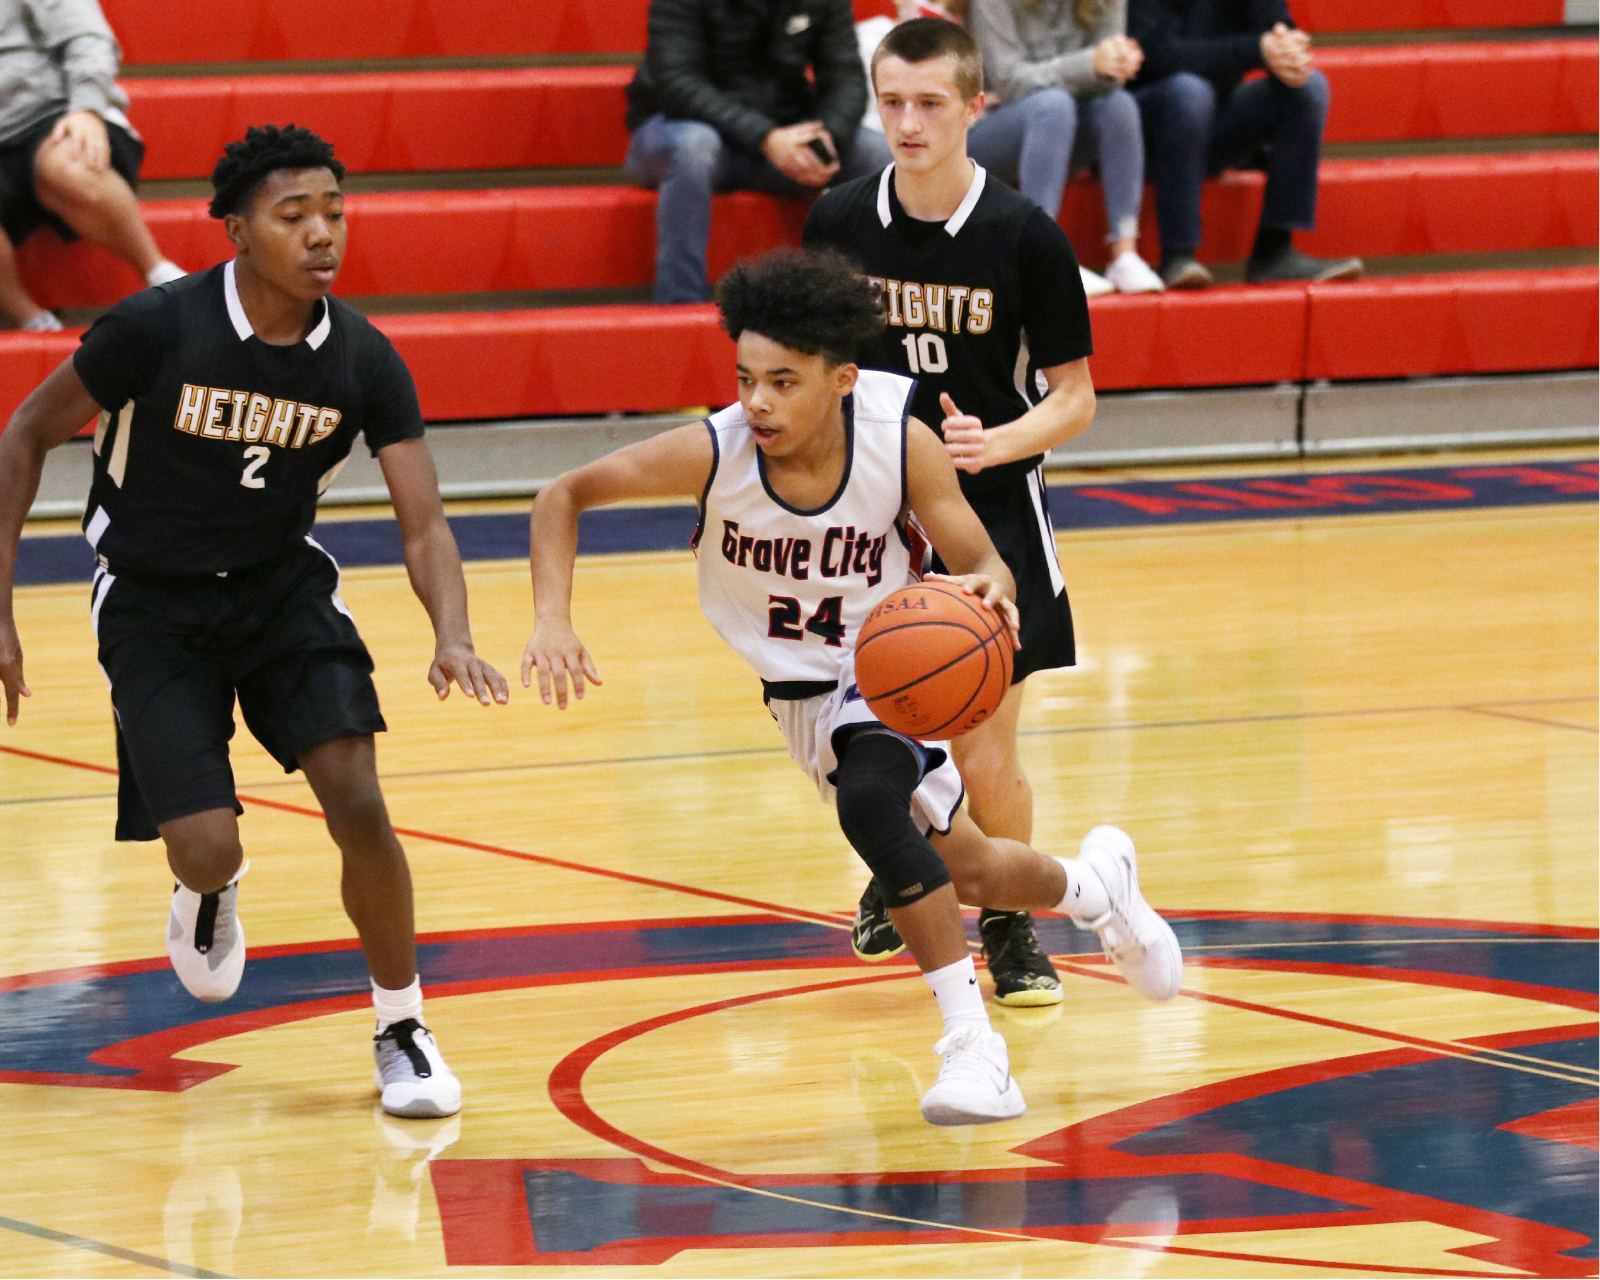 Boy's Freshman Basketball